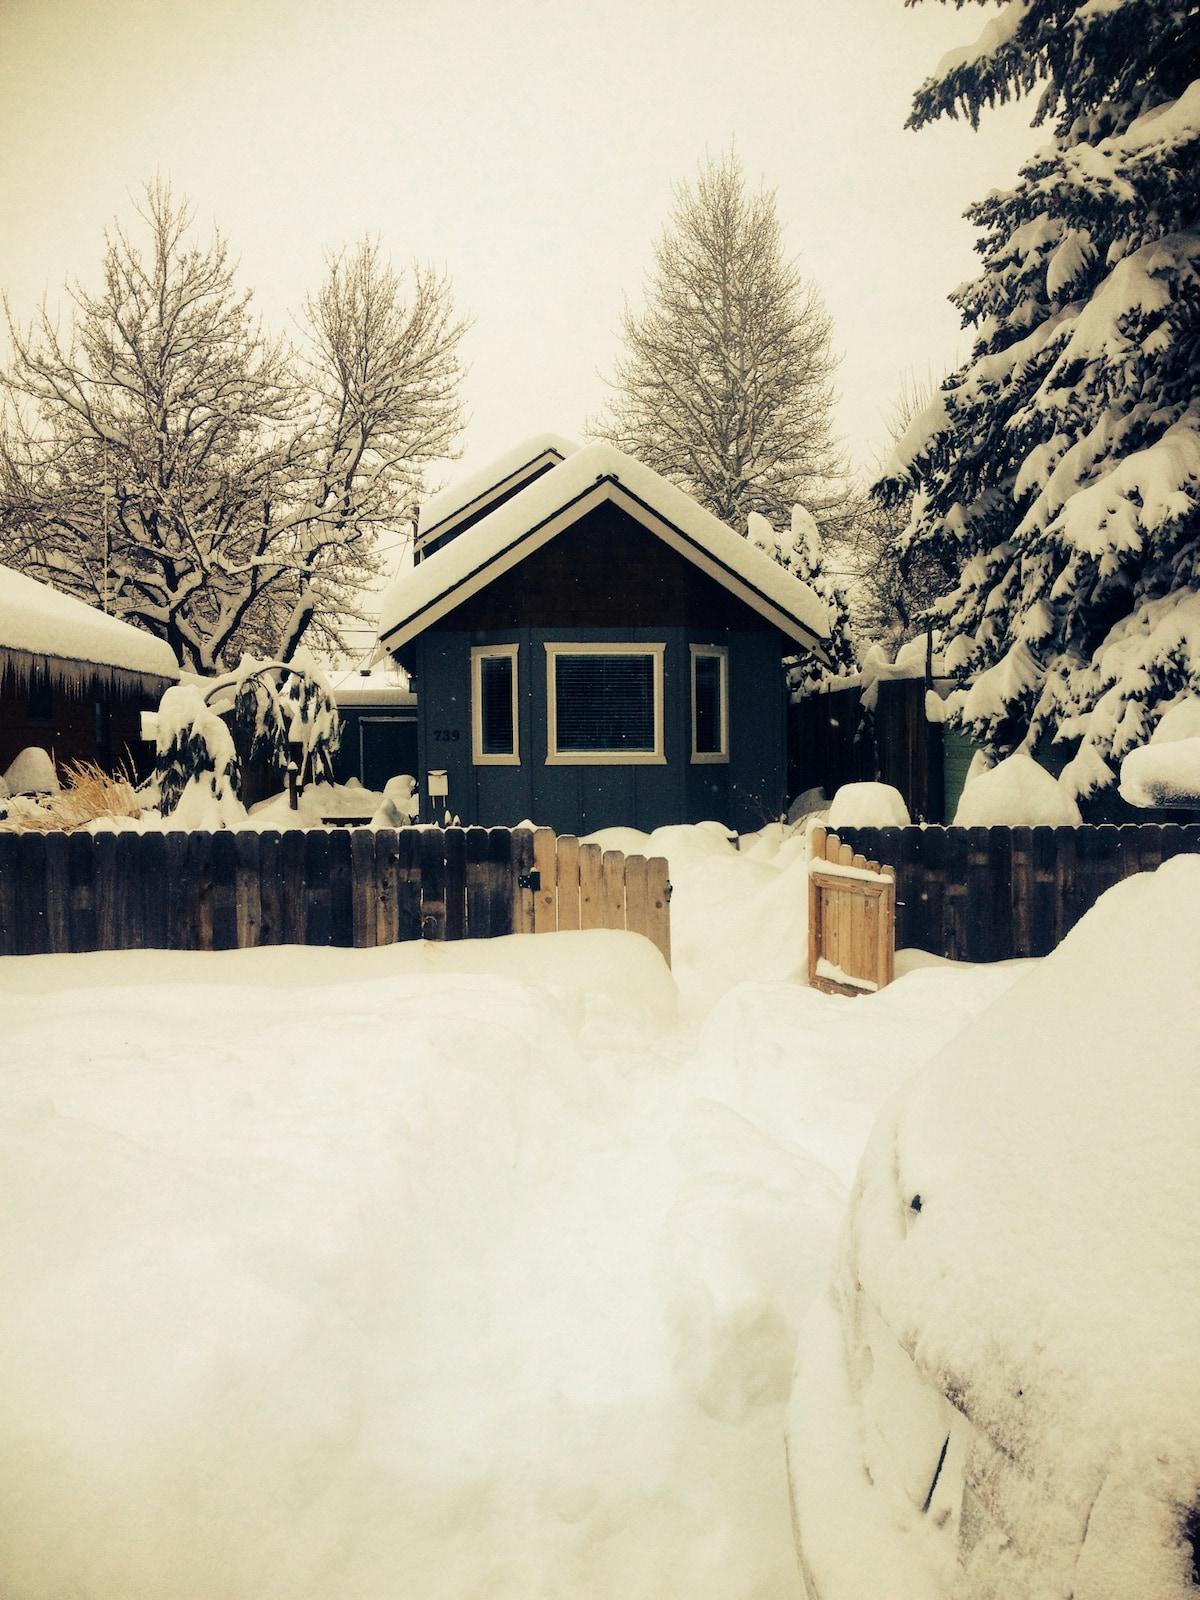 Winter in Bend!